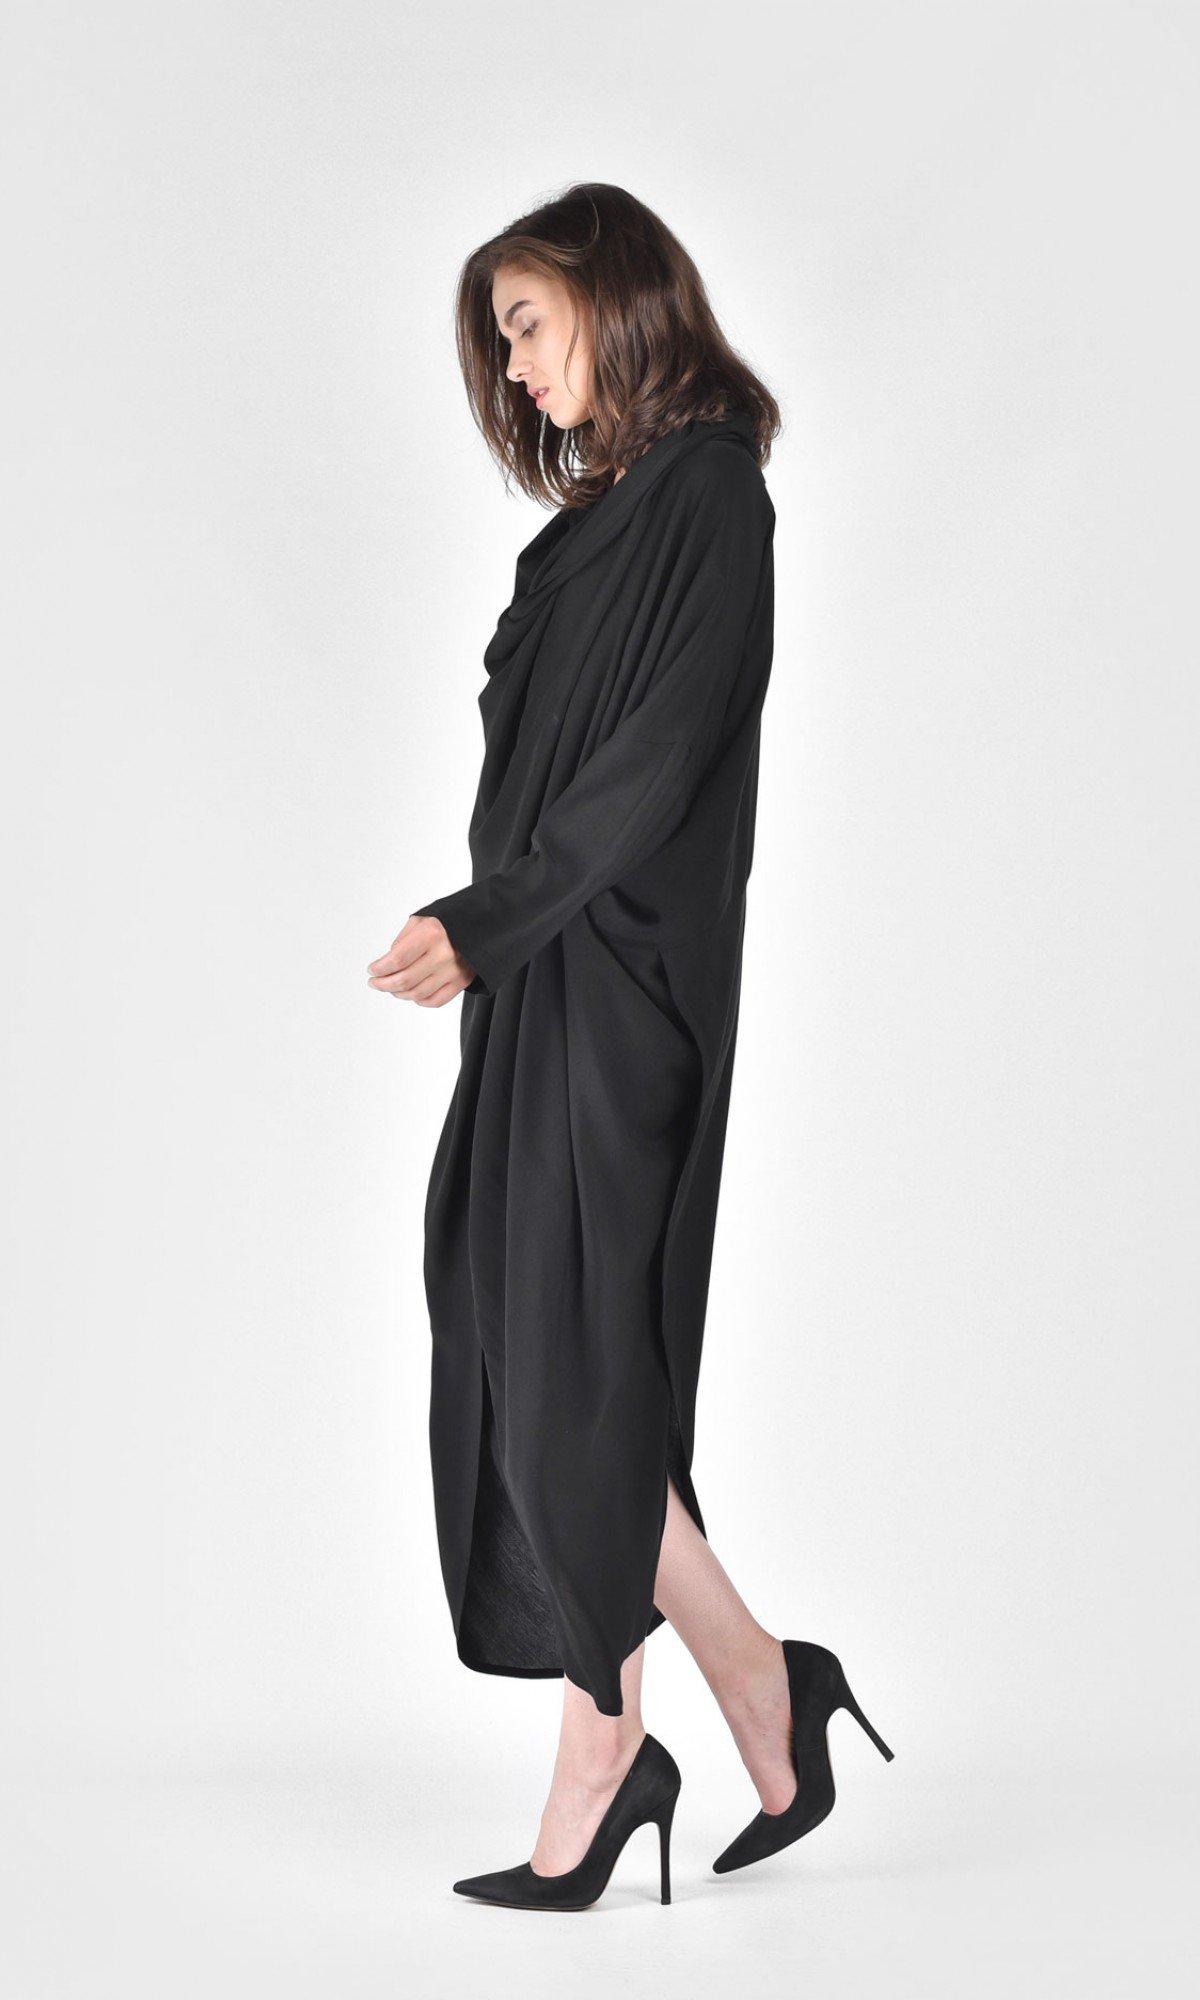 Extravagant Shirt Hooded Dress A03730